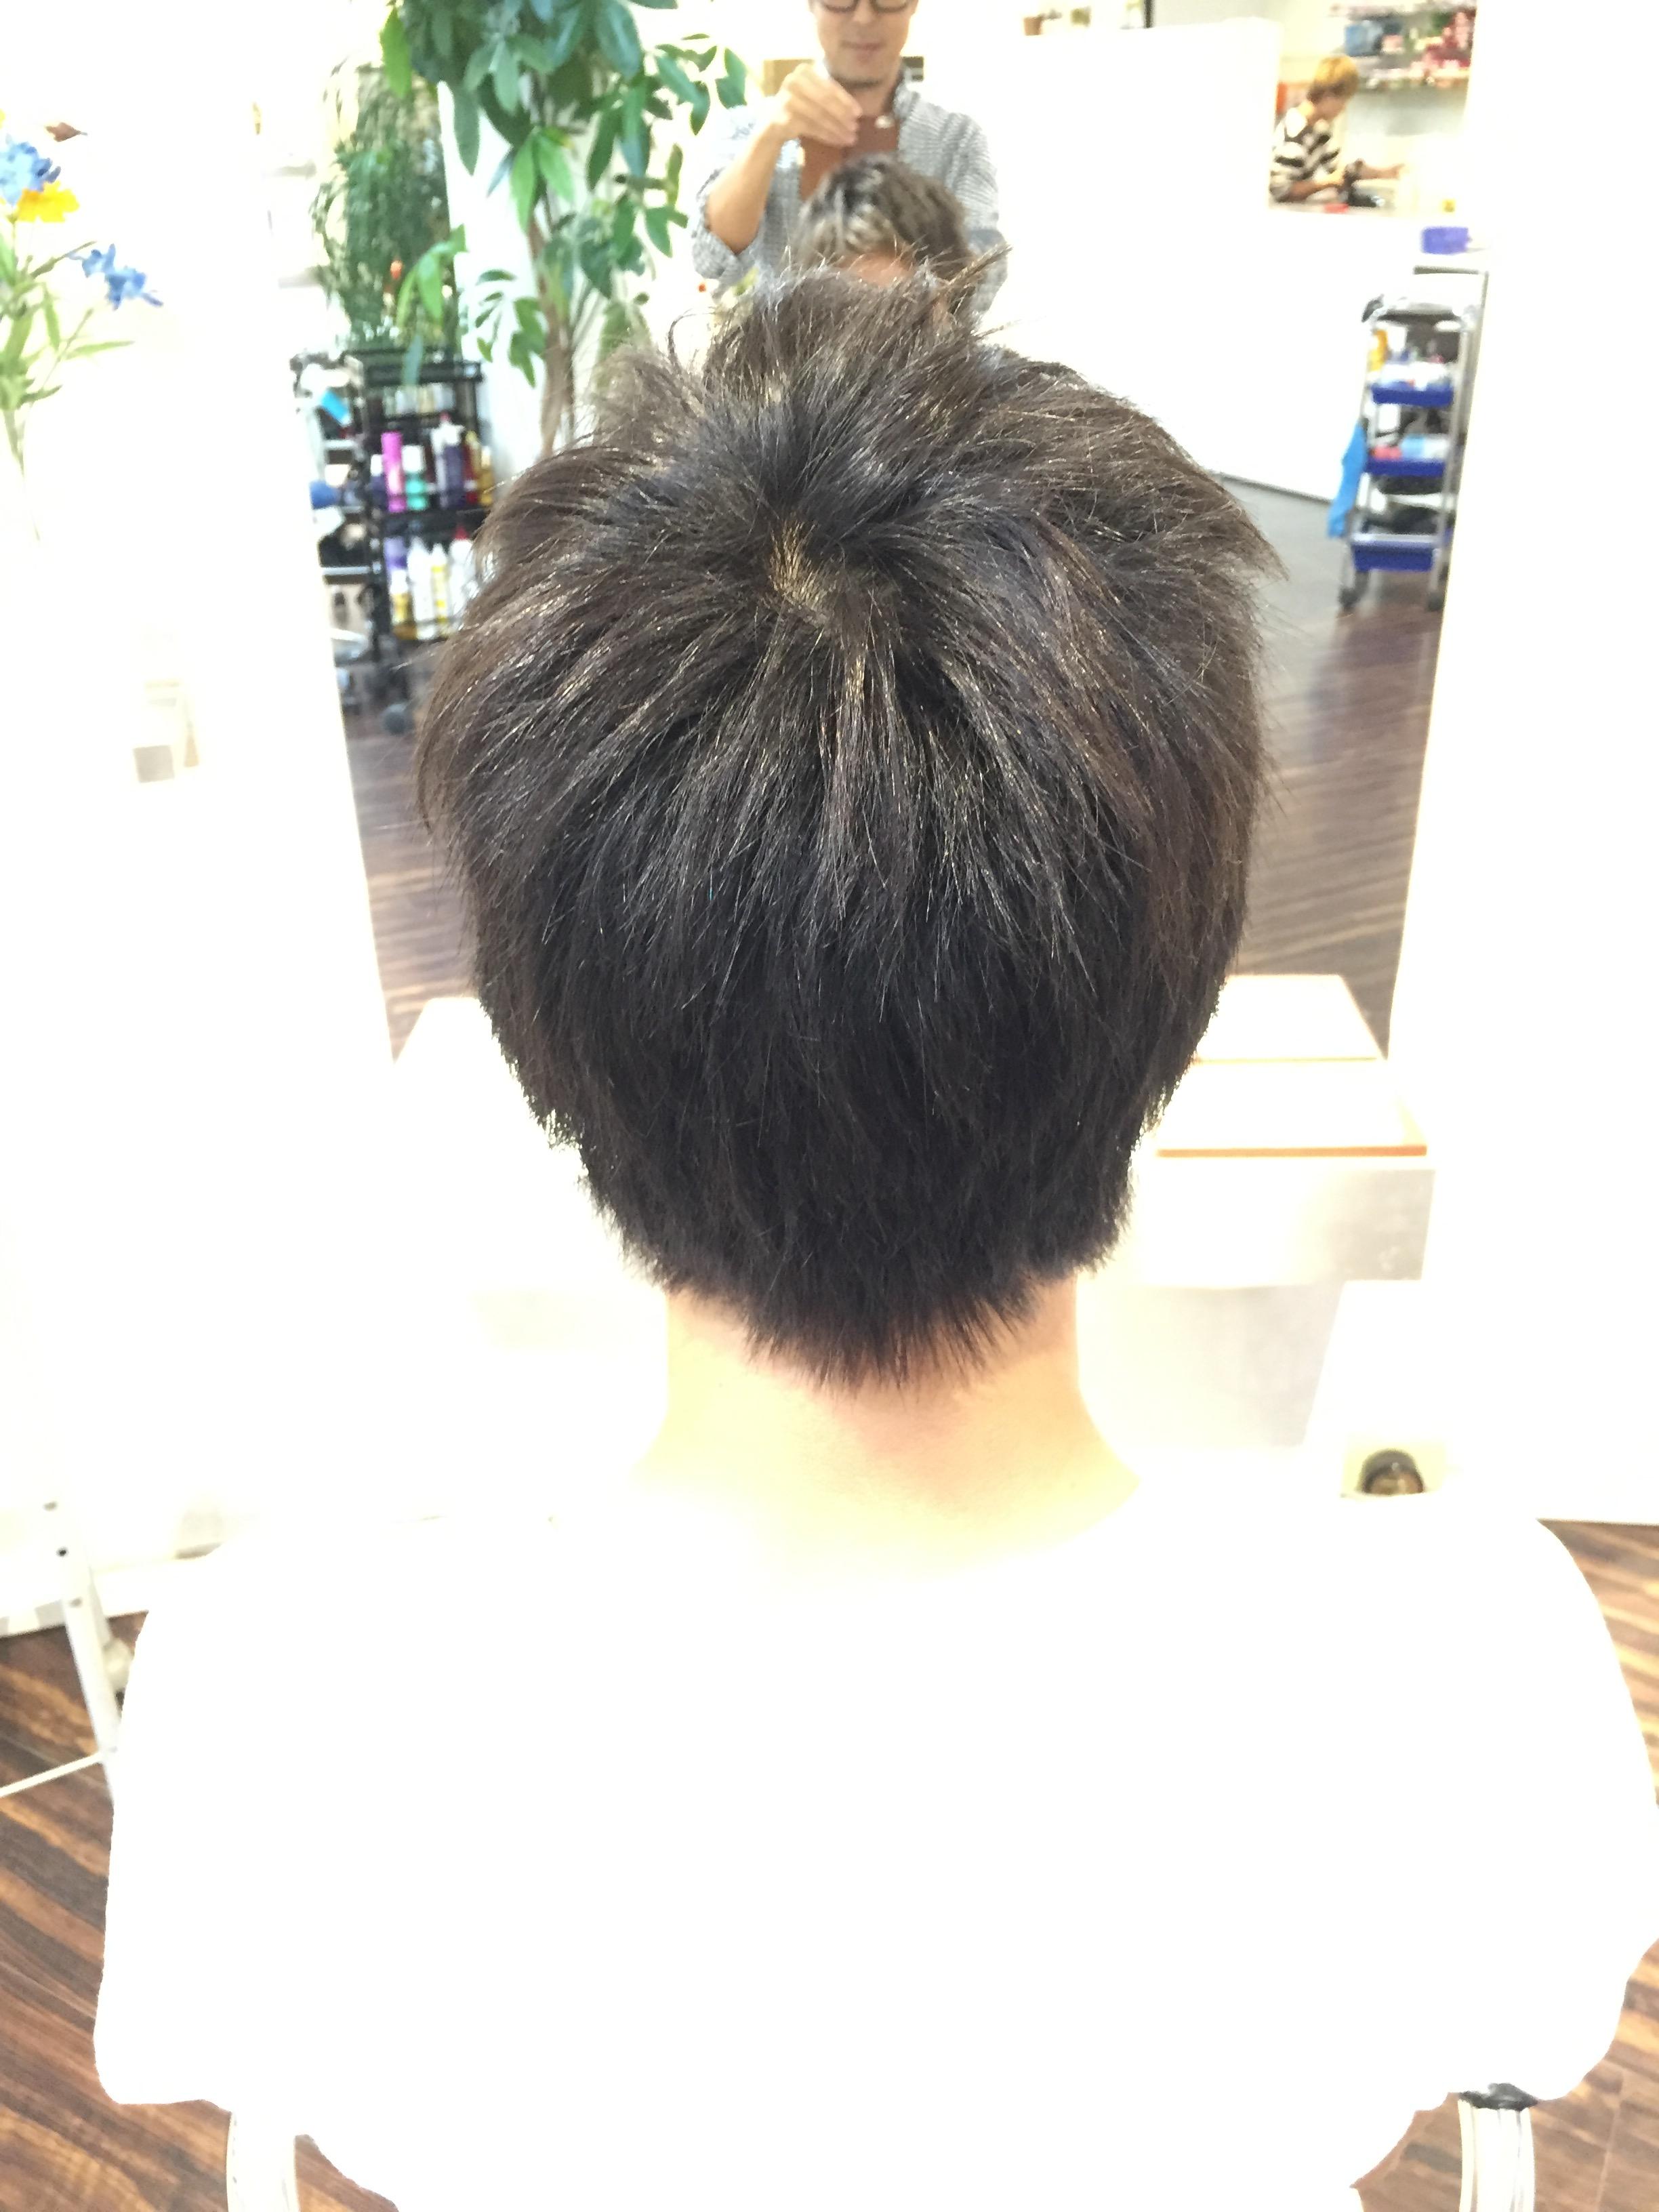 2016-09-14-17-04-03